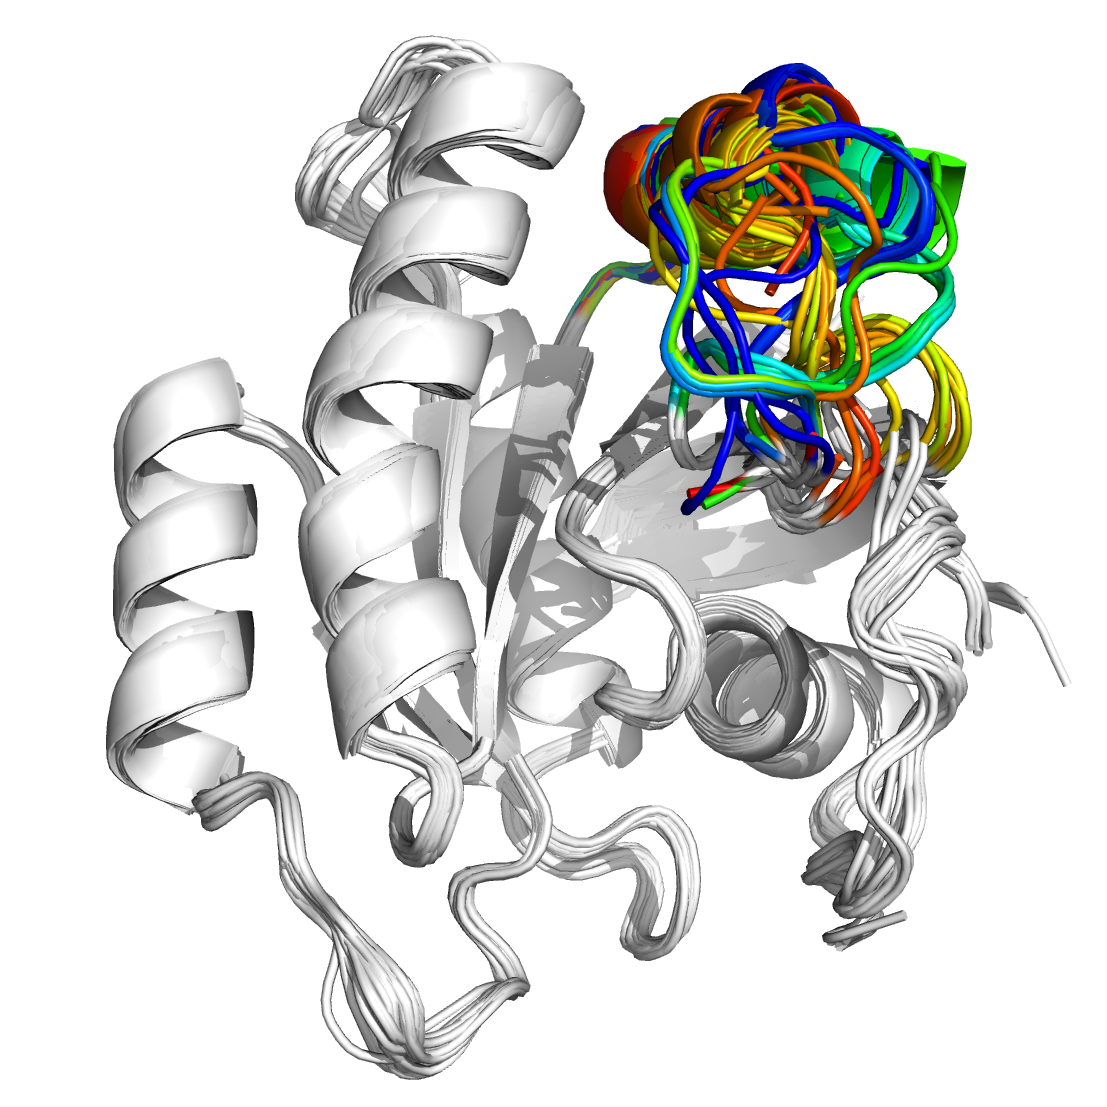 Covalent Allosteric Modulation